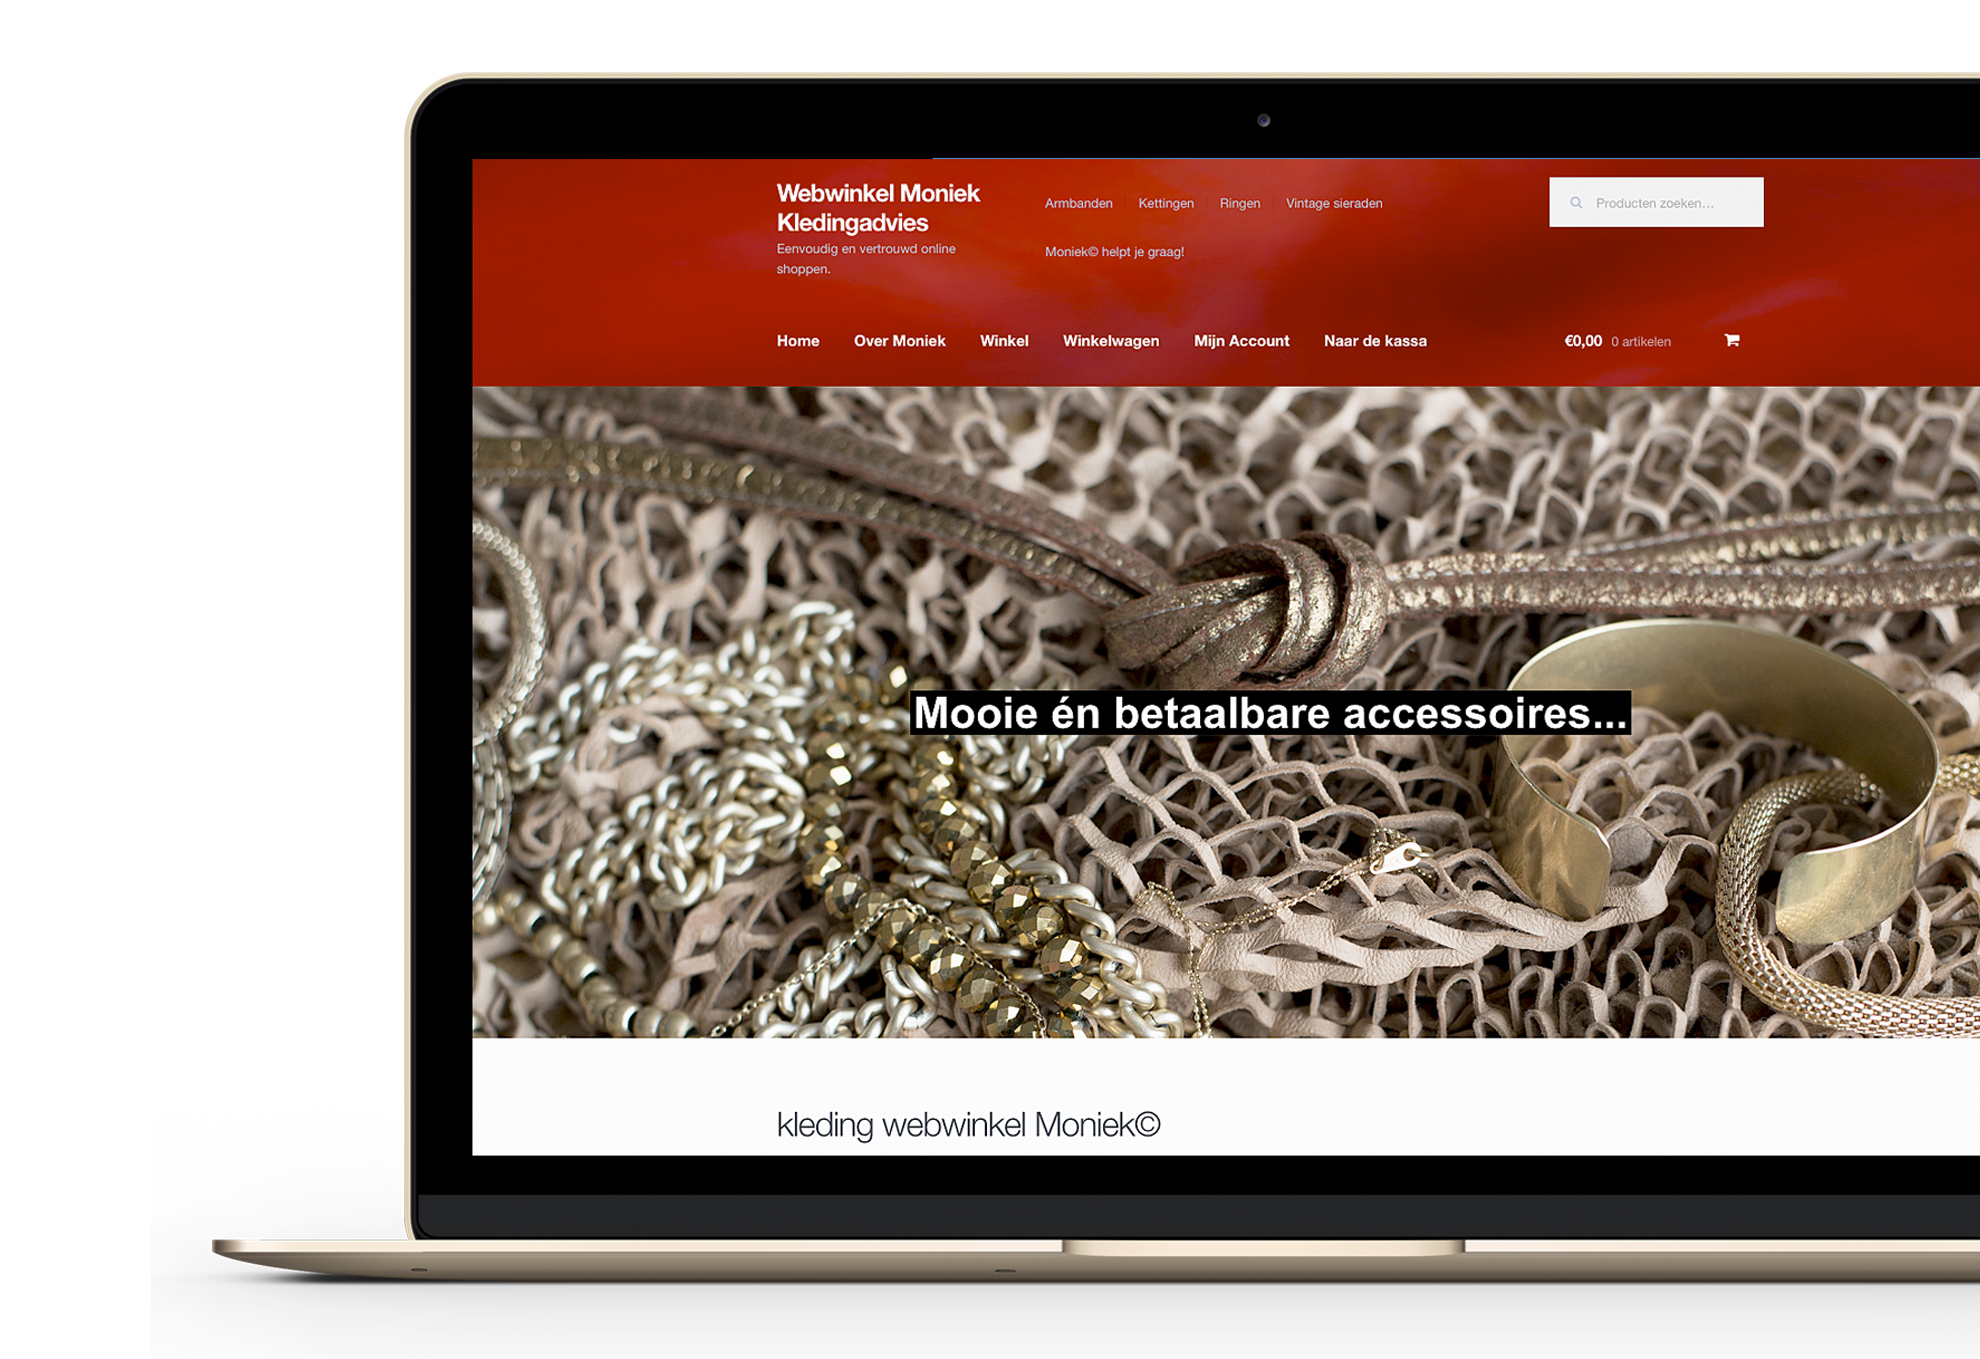 Webwinkel Moniek-Kledingadvies project